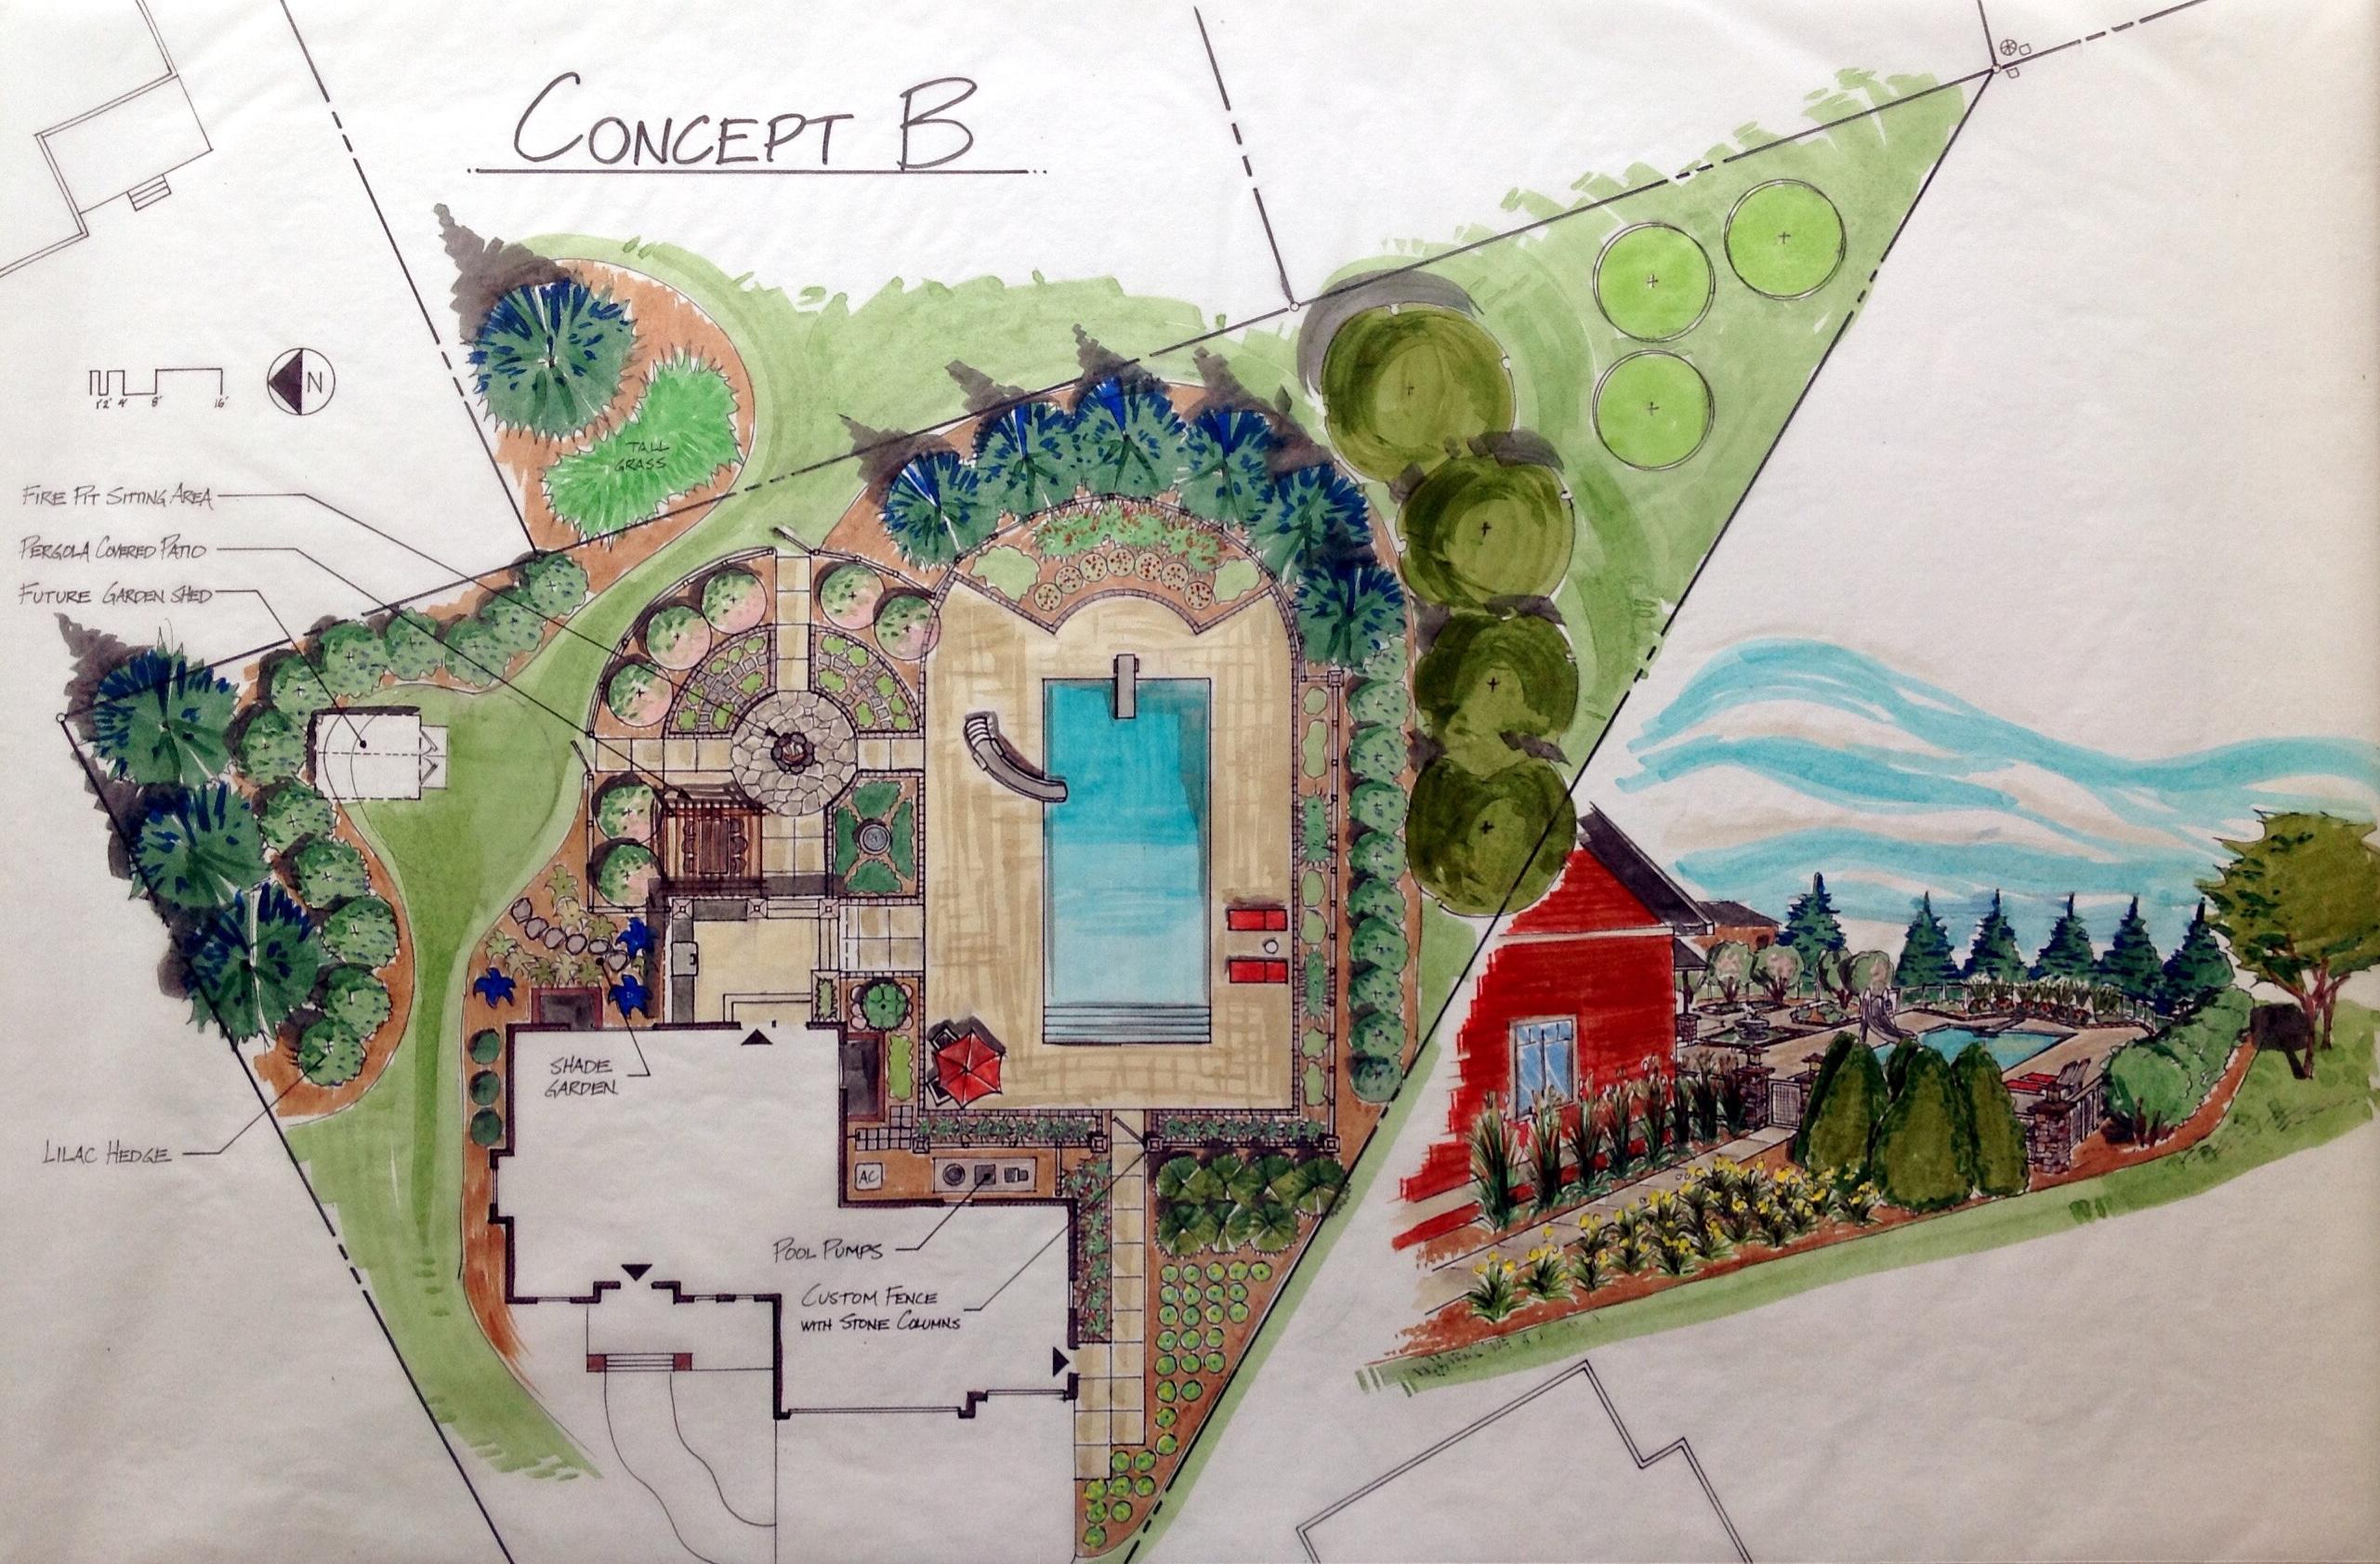 Concept B